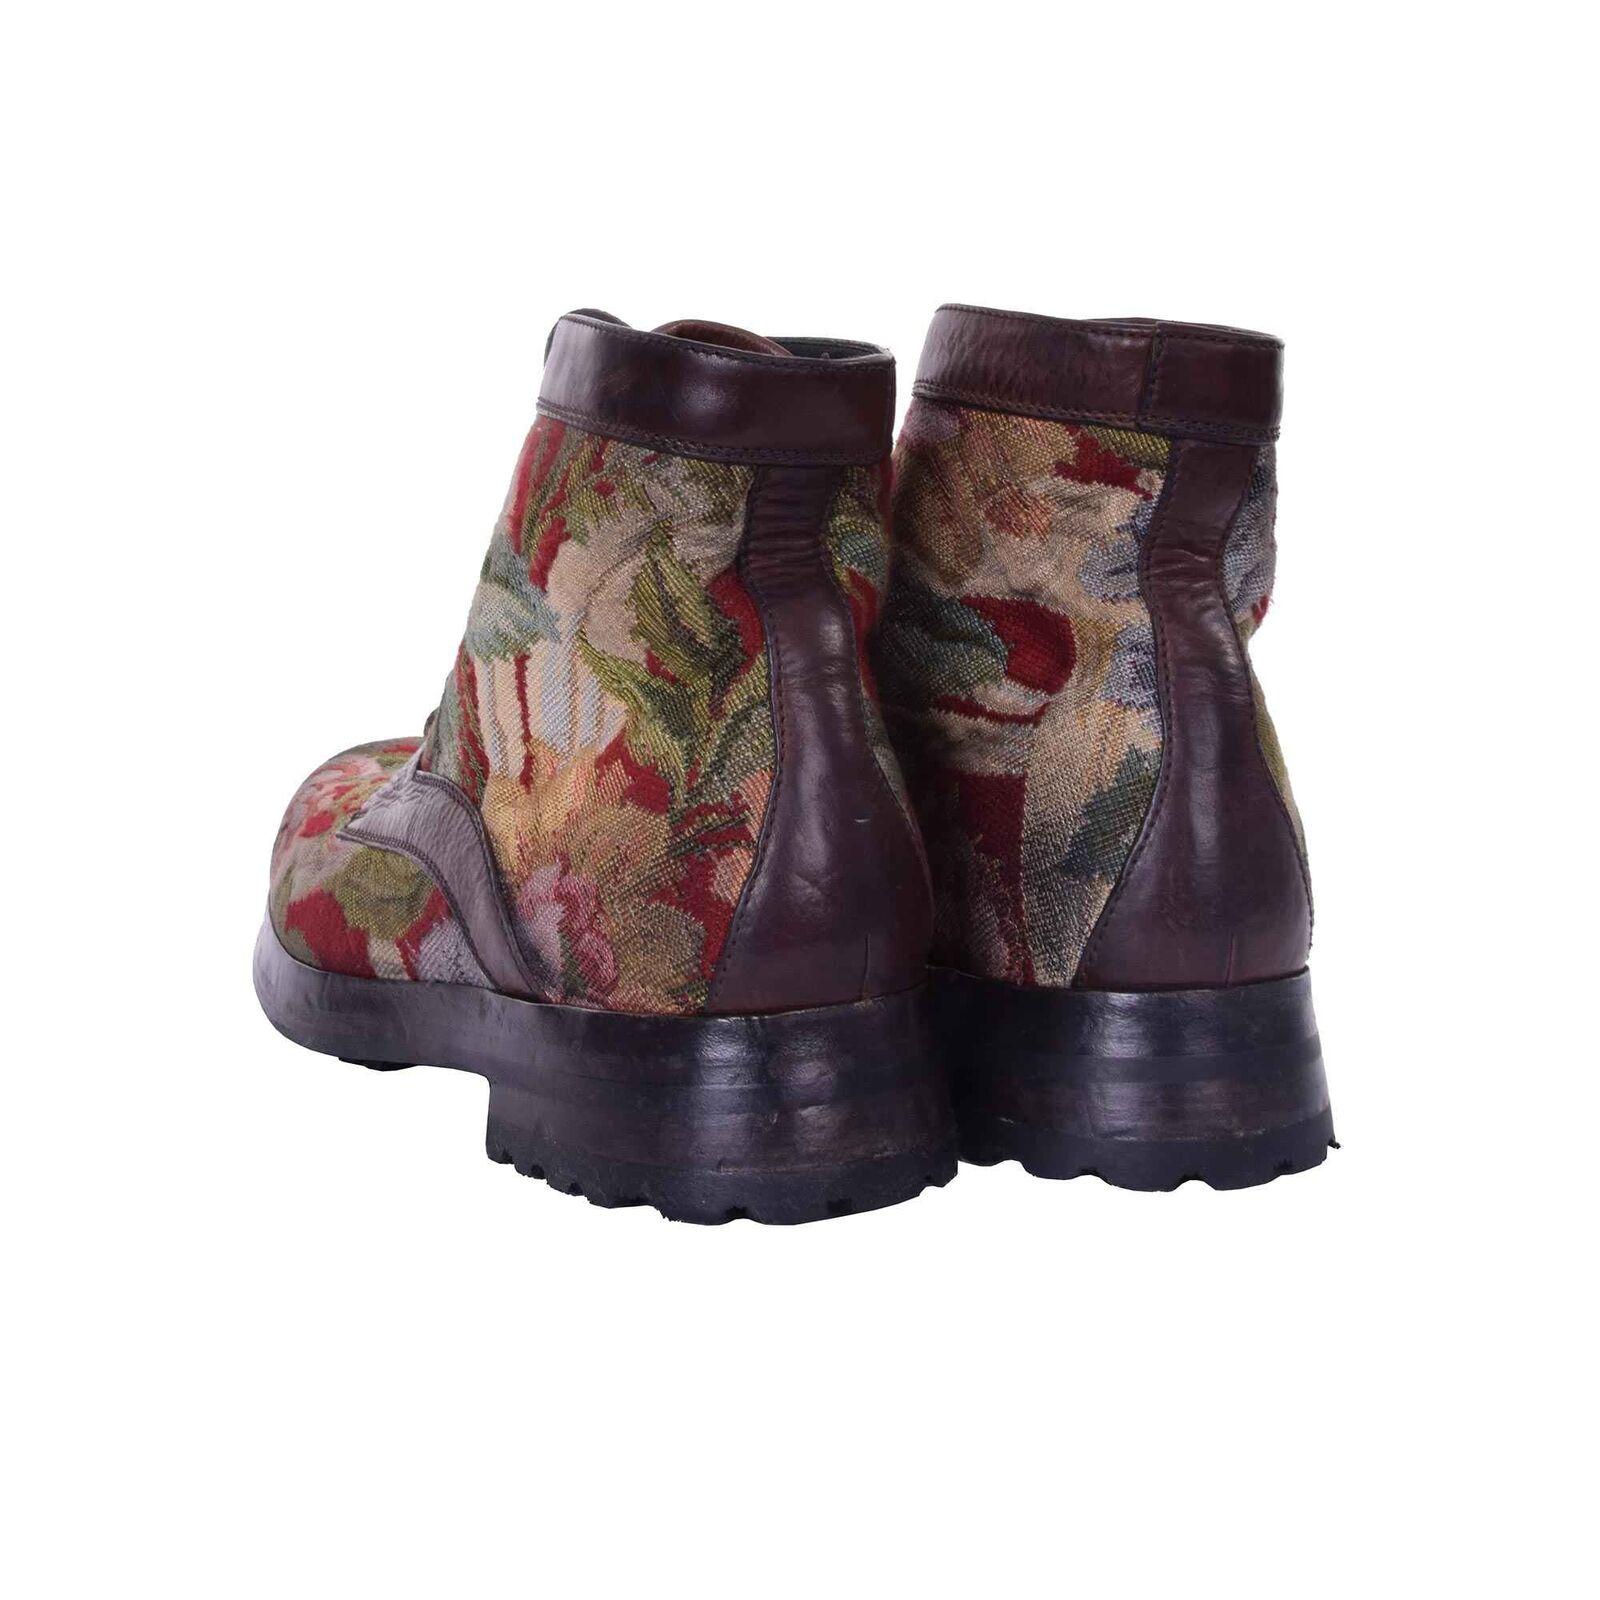 Chaussures Running Gt Course Asics De 5 Hommes Gel 2000 PqWPnxRXB